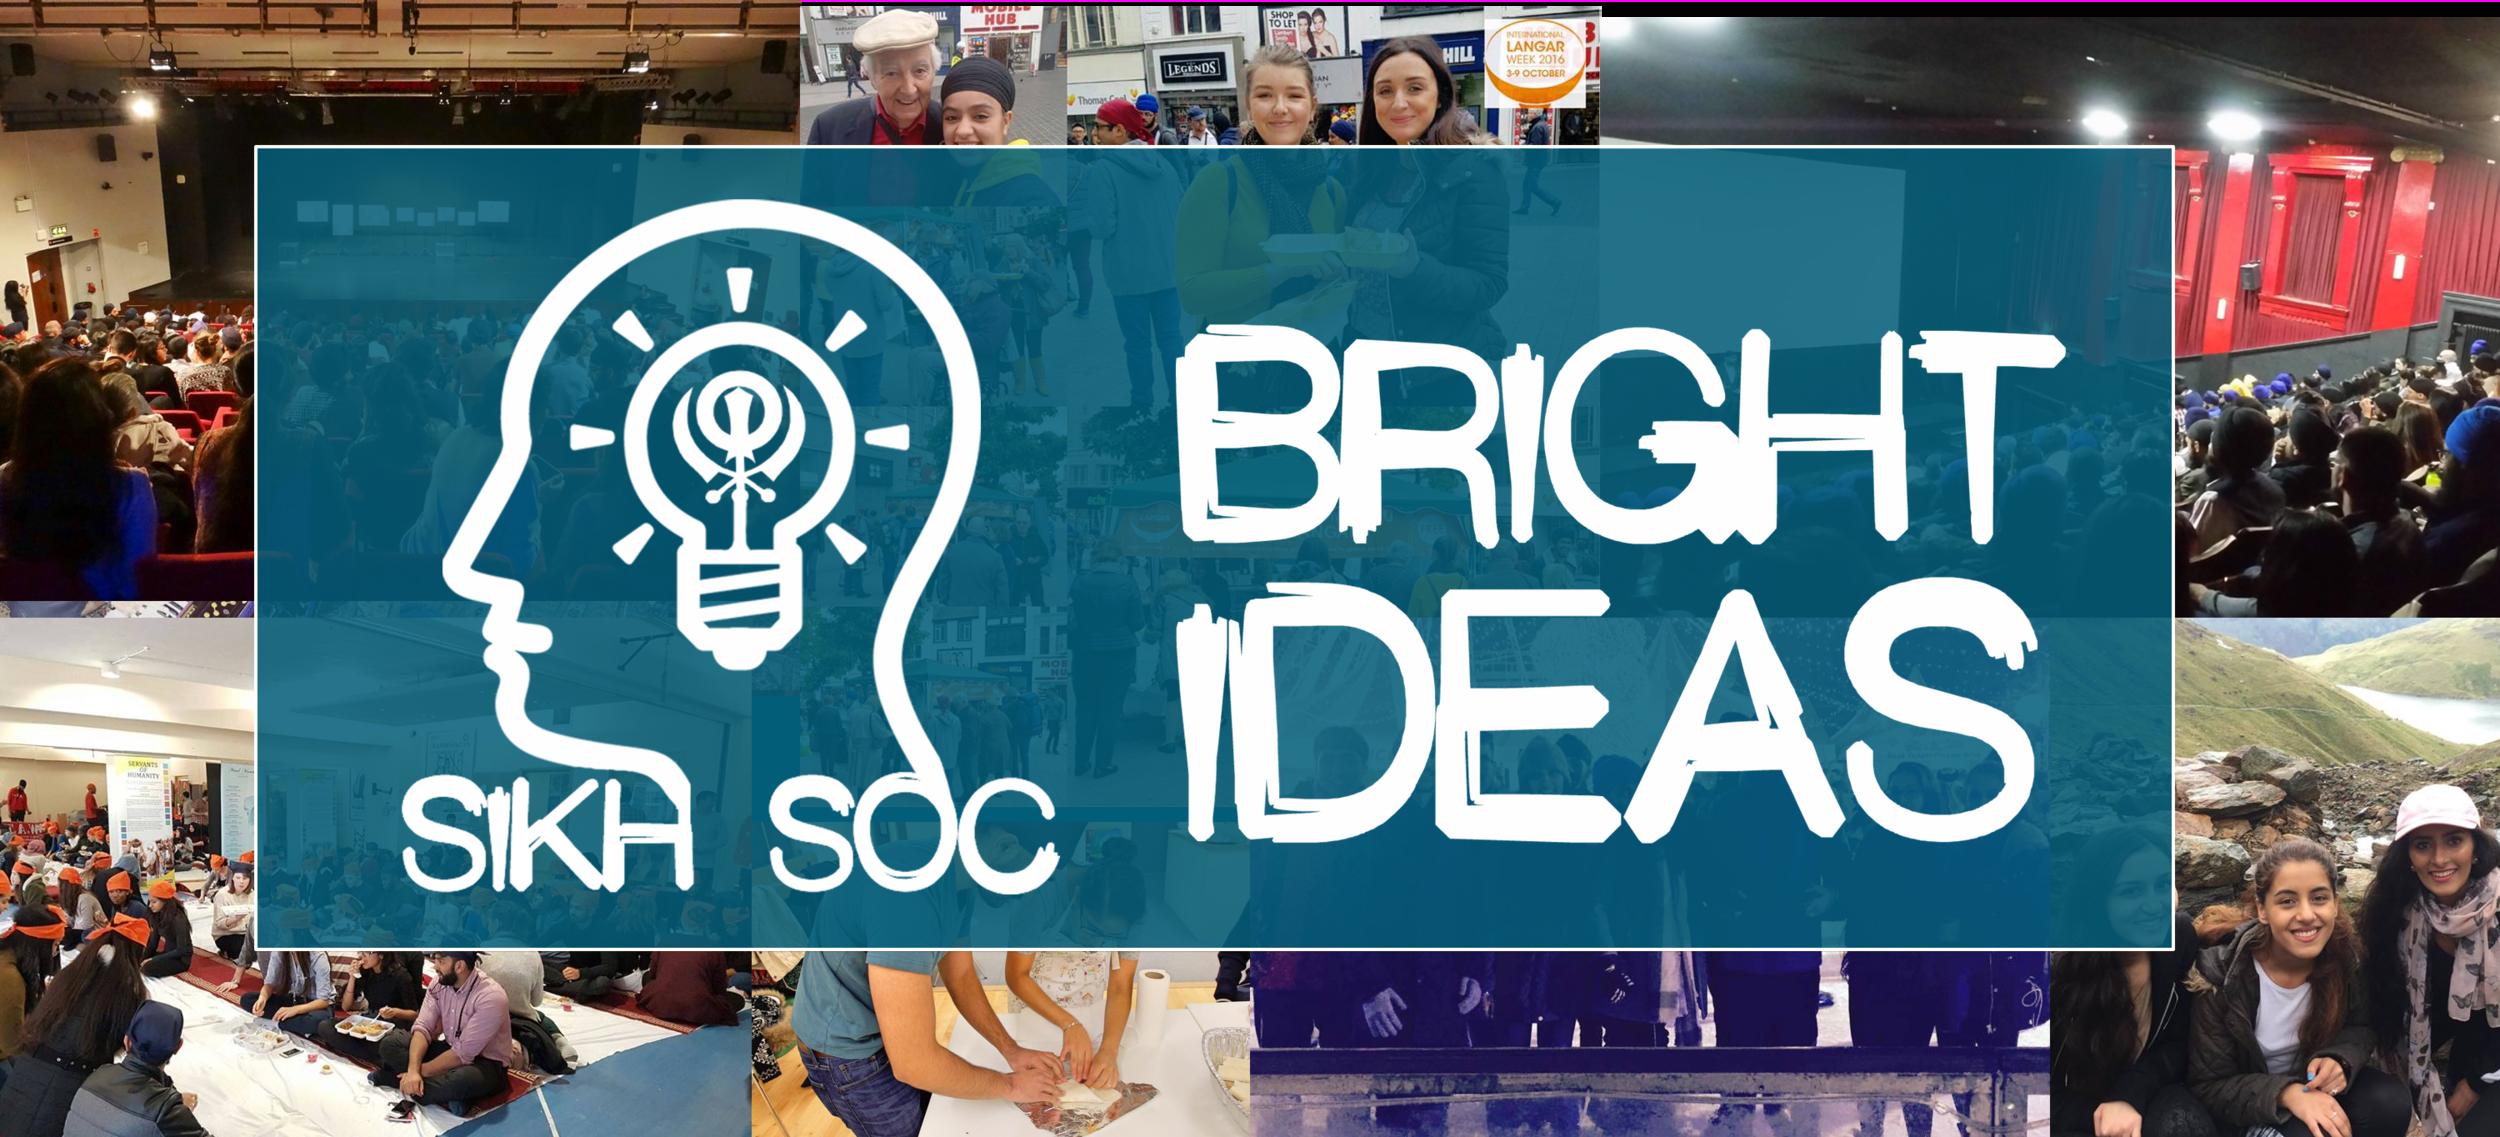 Sikh Soc Bright Ideas copy.png